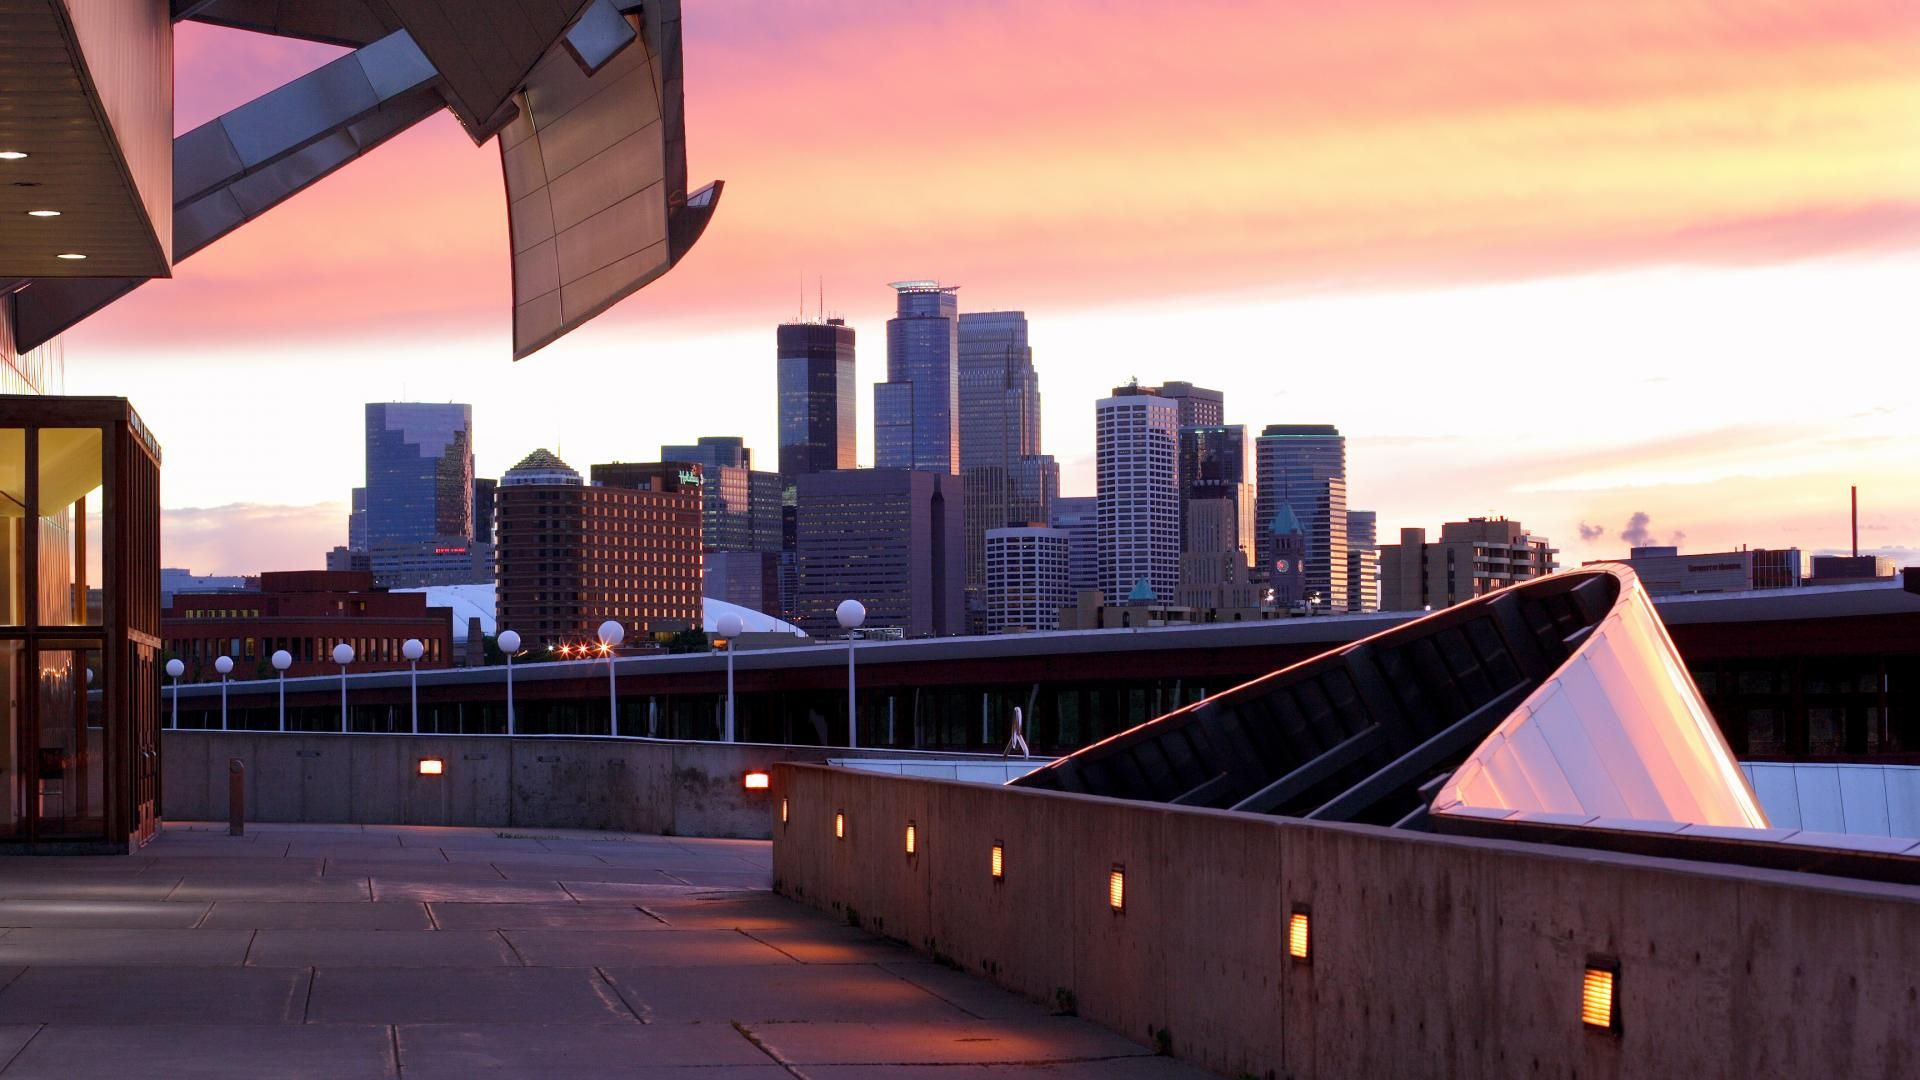 Minnesota free picture